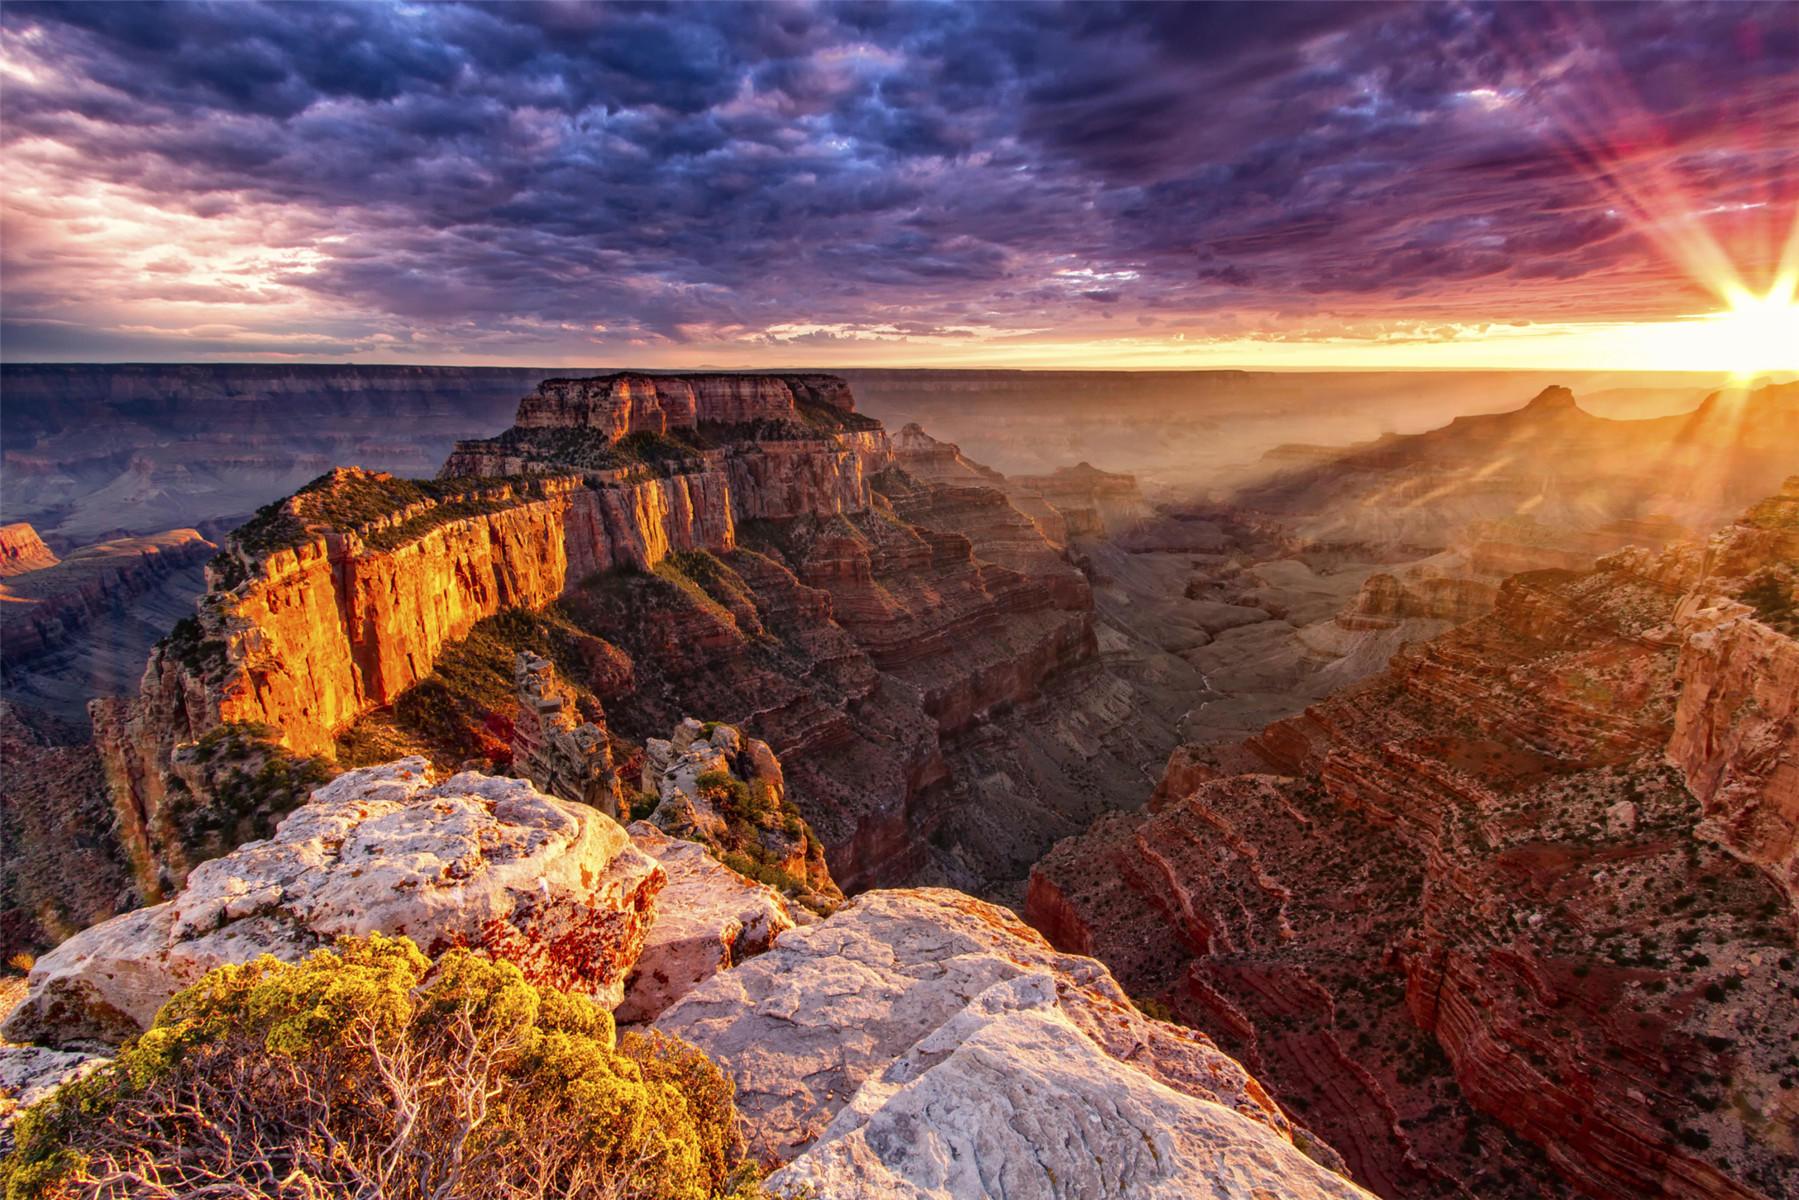 4-Day Yosemite, Las Vegas, Hoover Dam, Grand Canyon Tour from San ...